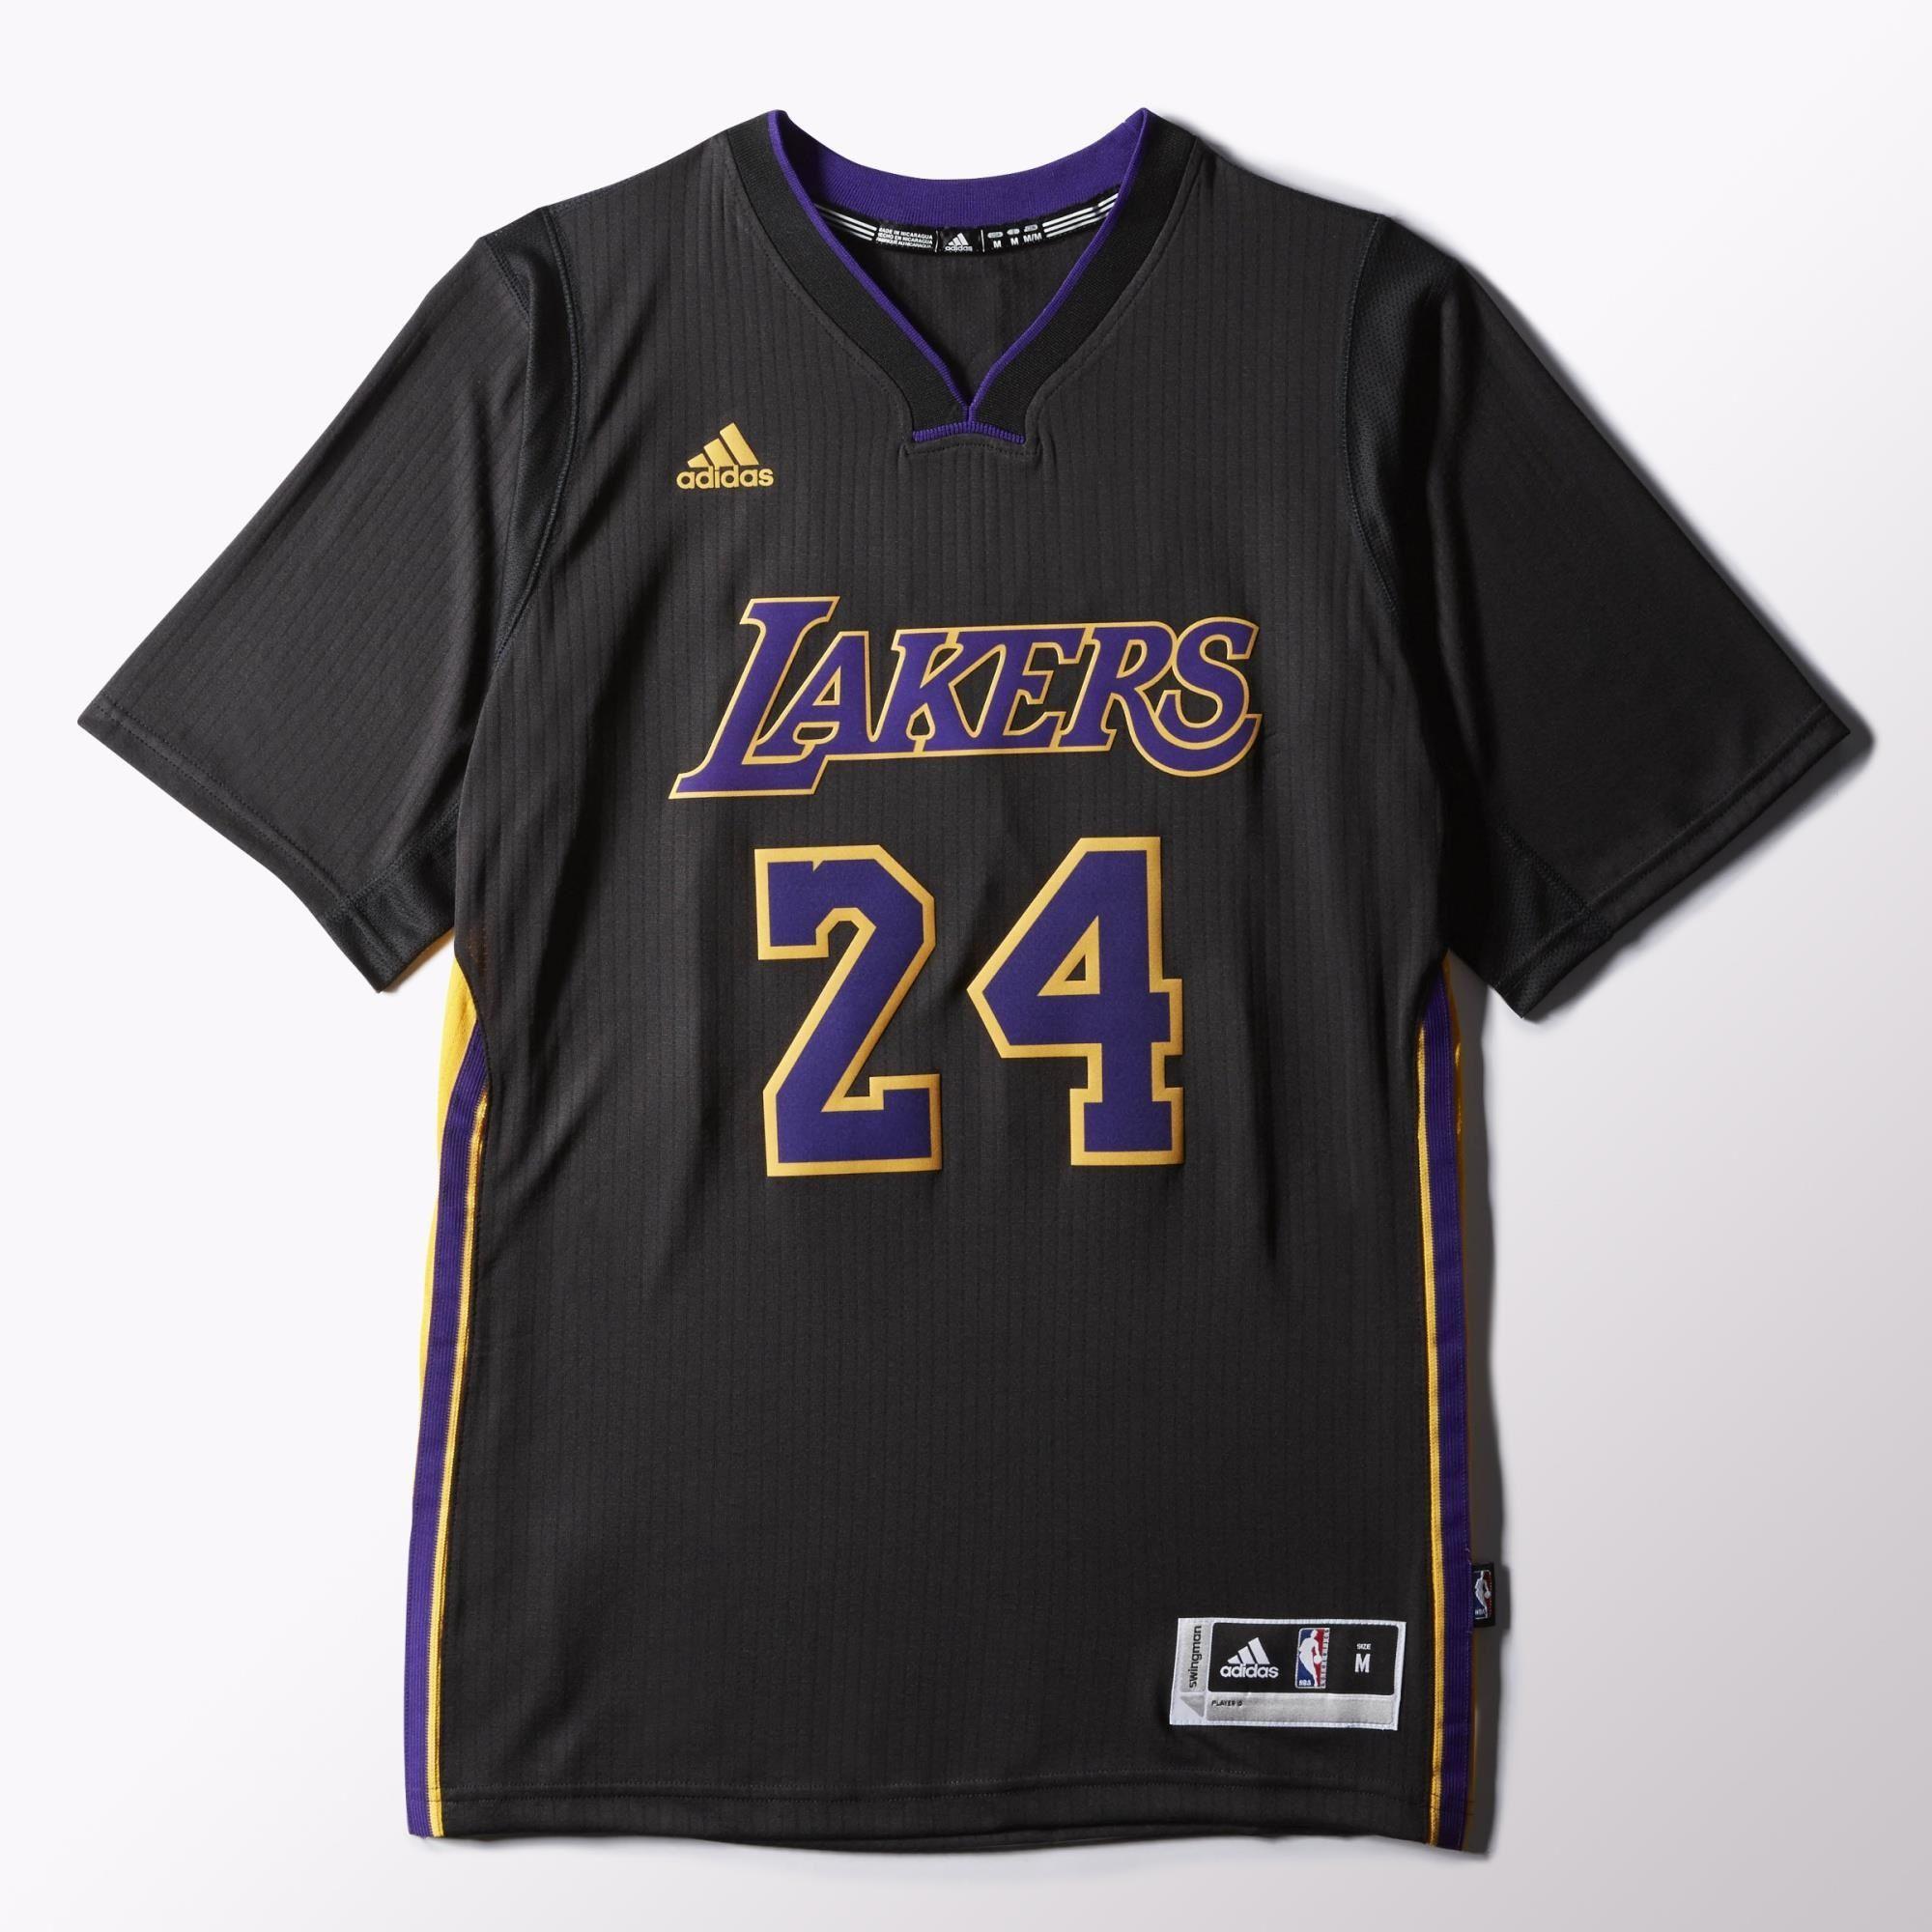 Adidas Kobe Bryant Lakers Pride Swingman Jersey Black Adidas Us Nba T Shirts Basketball Vests Mens Basketball Jerseys